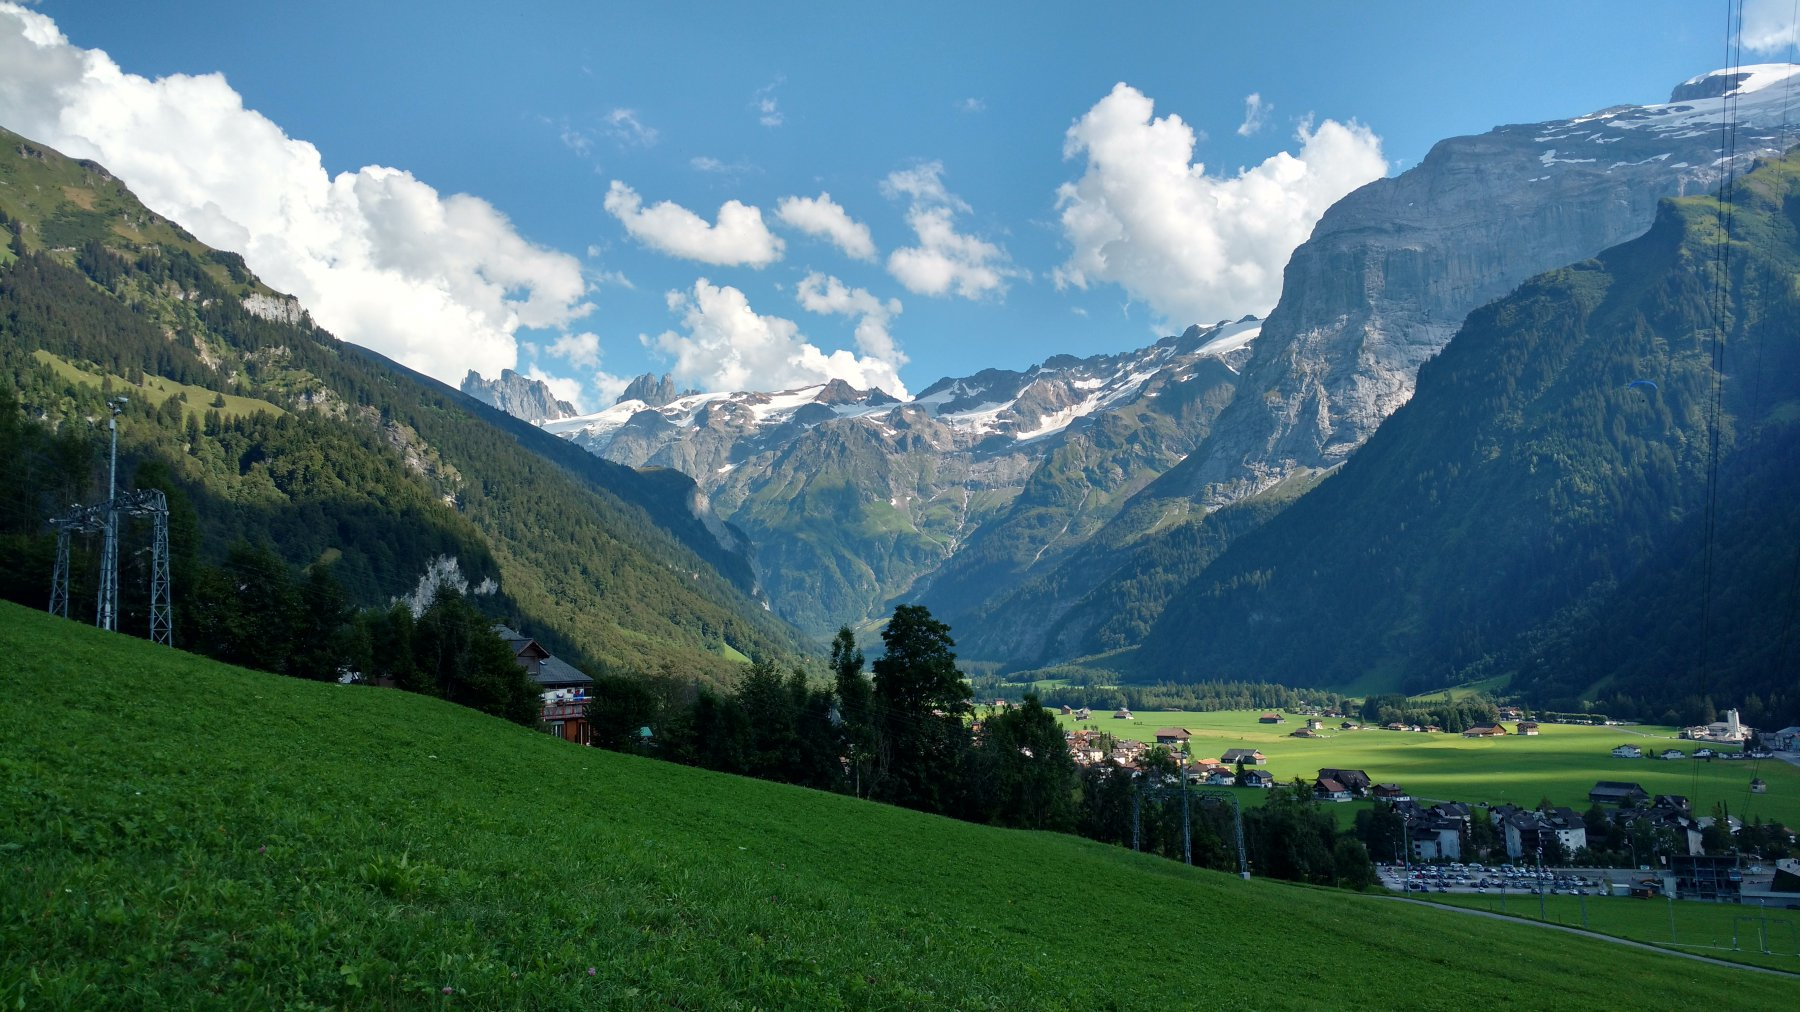 La valle di Engelberg